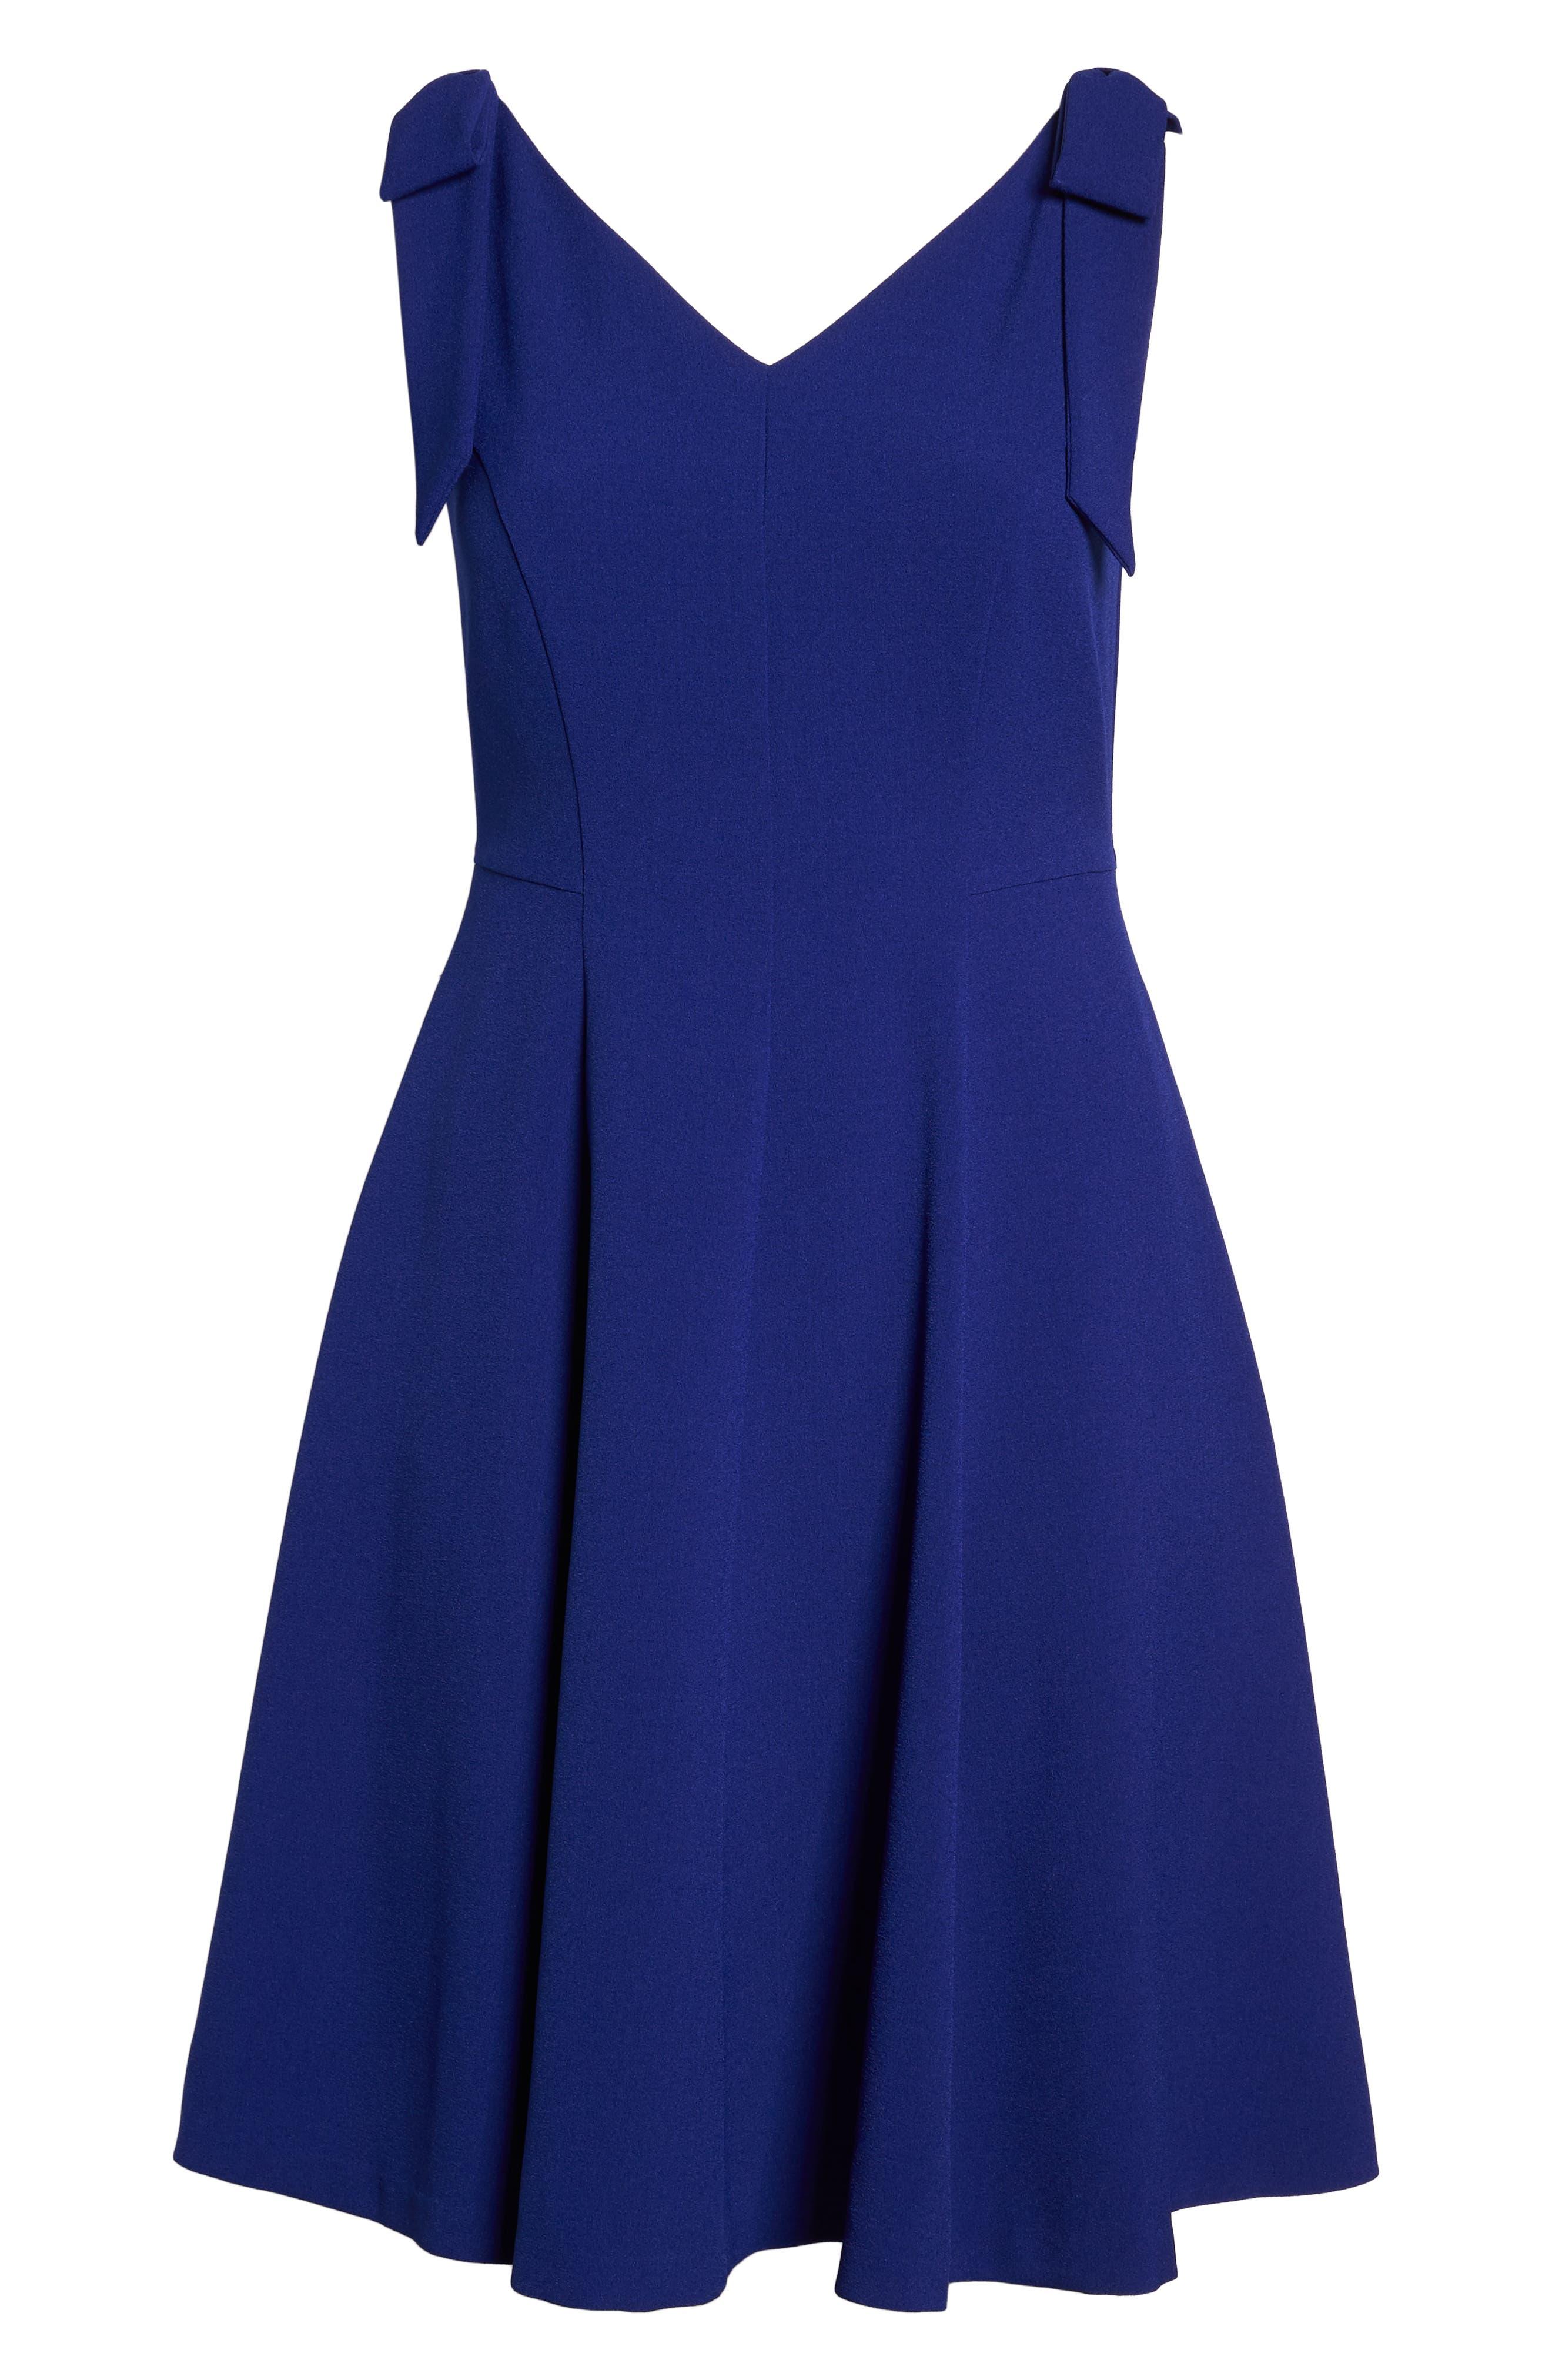 Tie-Shoulder Fit & Flare Dress,                             Alternate thumbnail 7, color,                             Cobalt